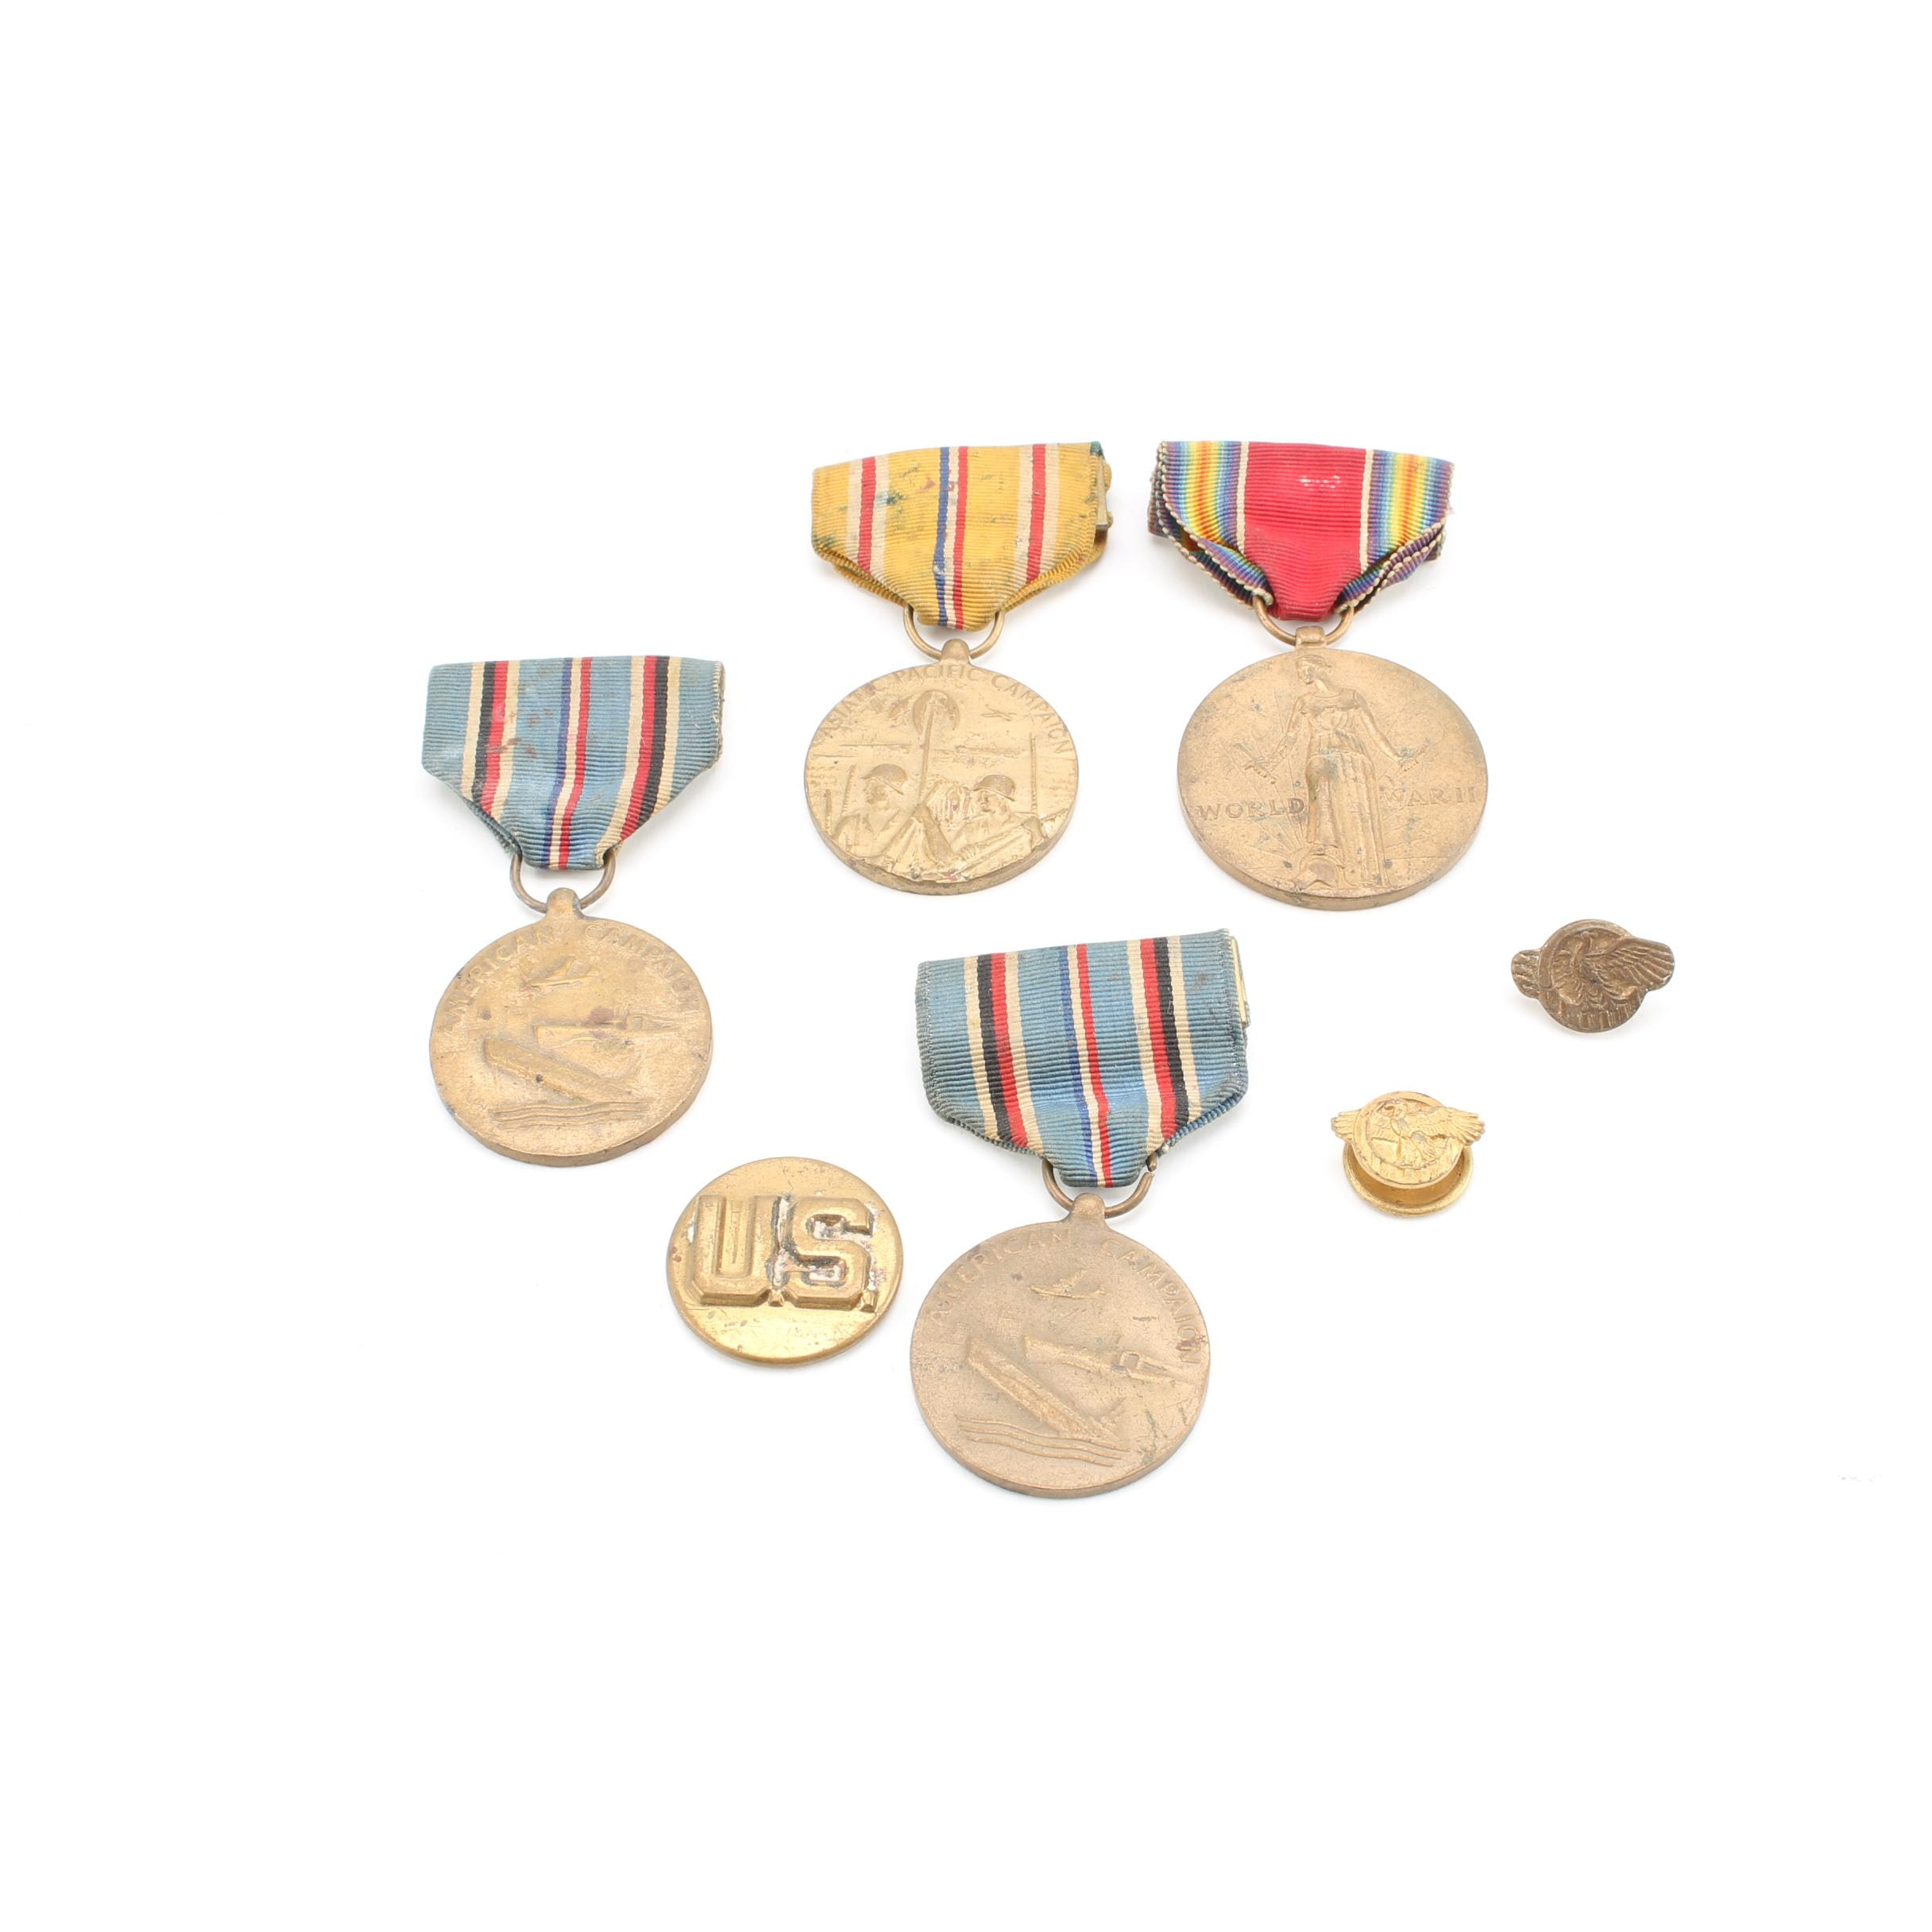 United States World War II Medals